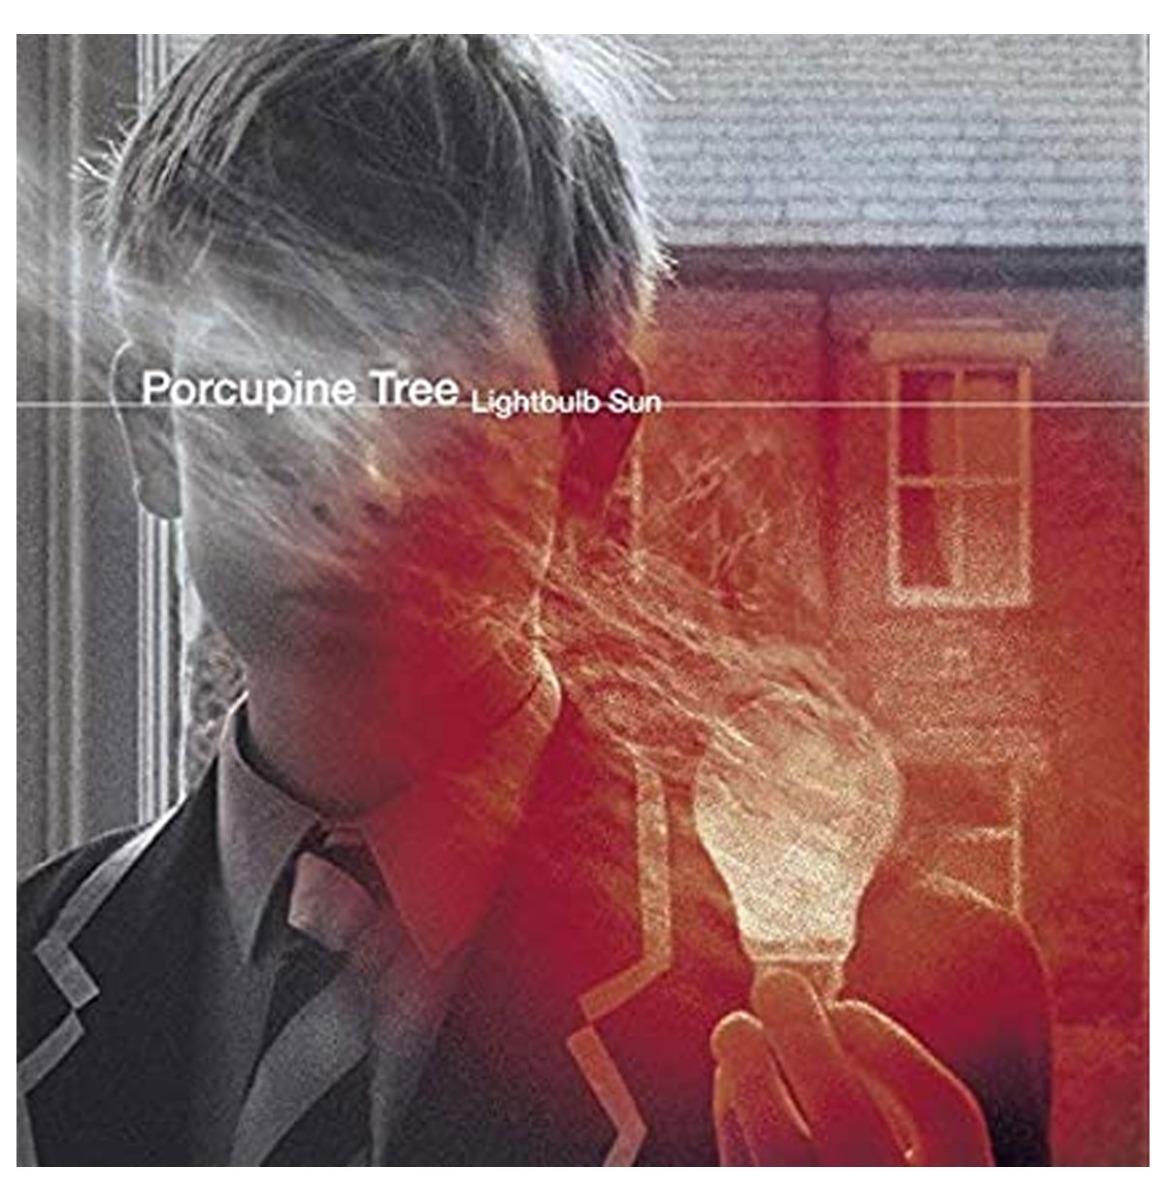 Porcupine Tree - Lightbulb Sun 2-LP